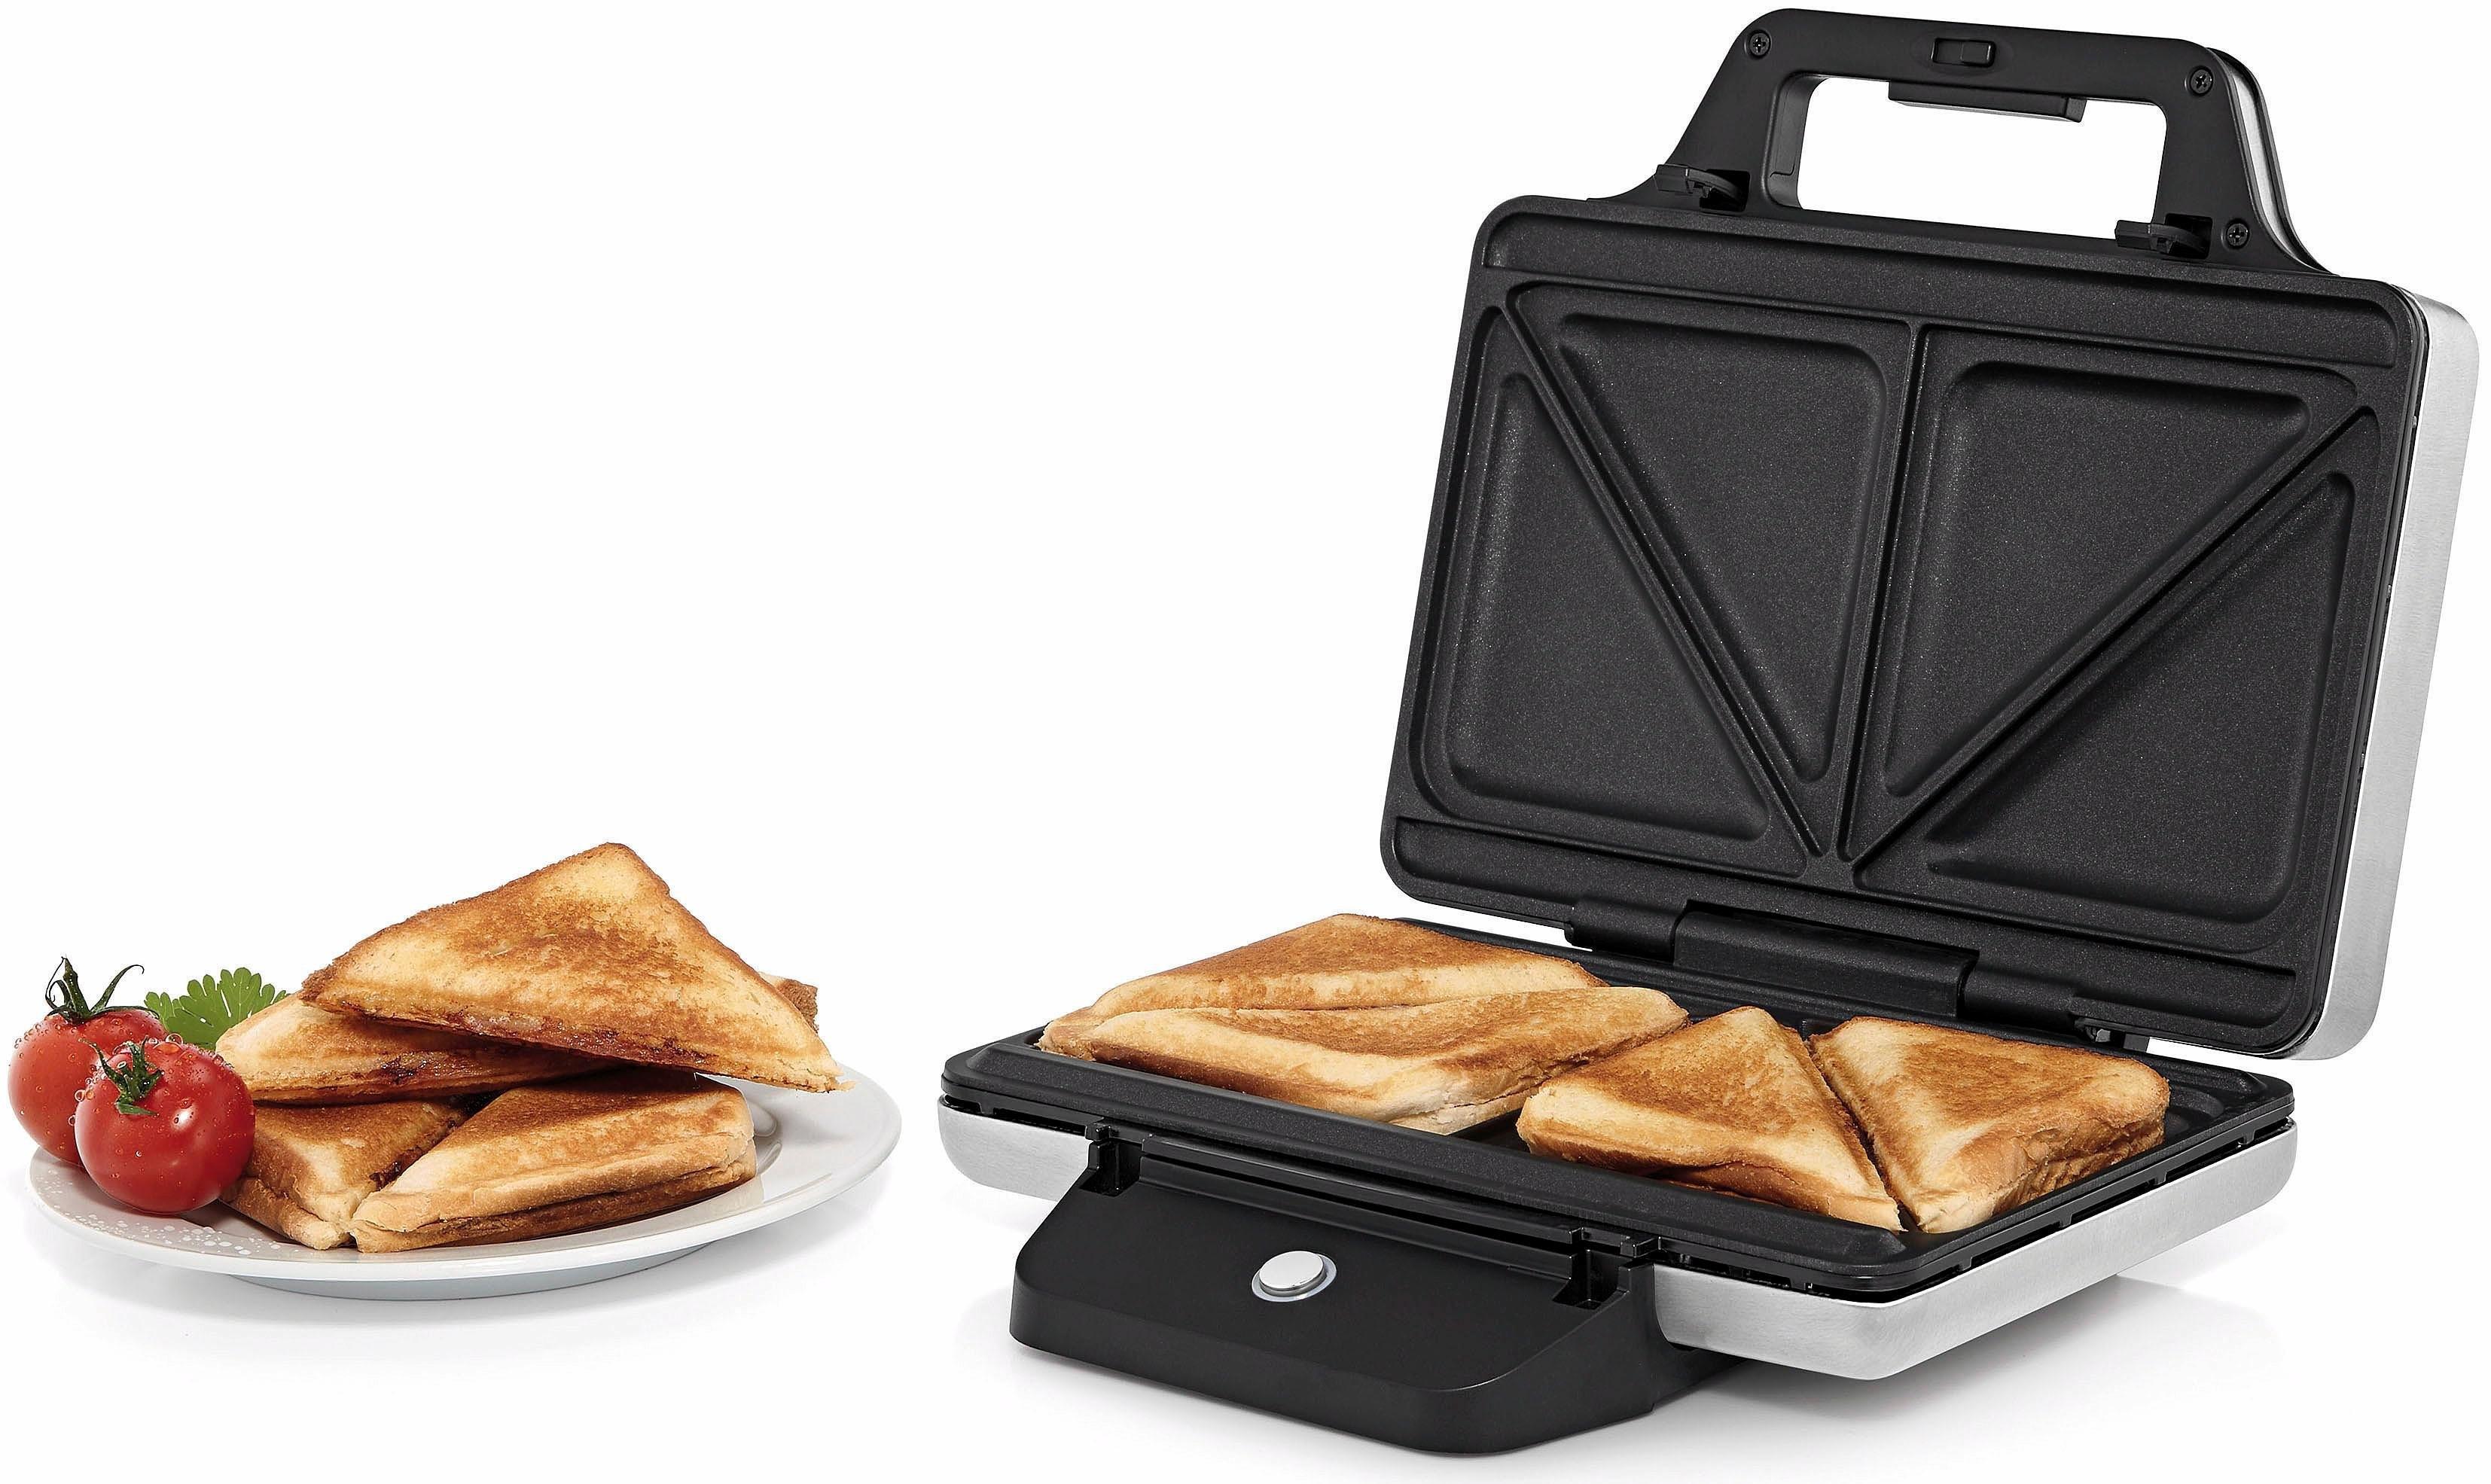 WMF sandwichmaker LONO bestellen: 30 dagen bedenktijd